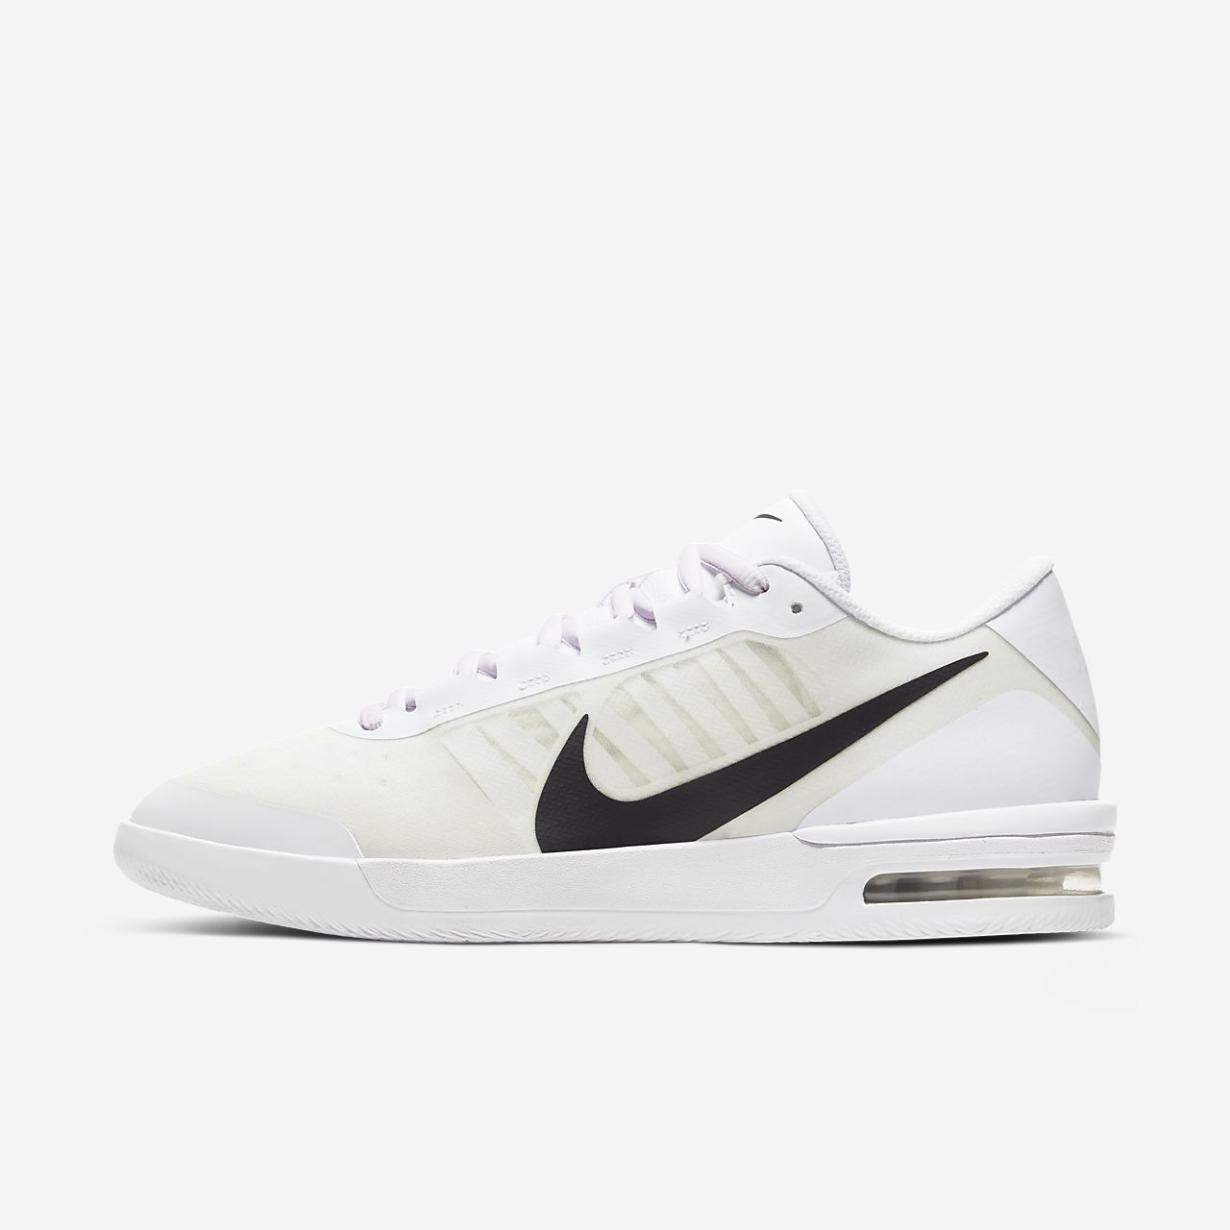 Nike VaporMax < Nike En Ligne Pas Cher Vente - FR < Gooddaytricities